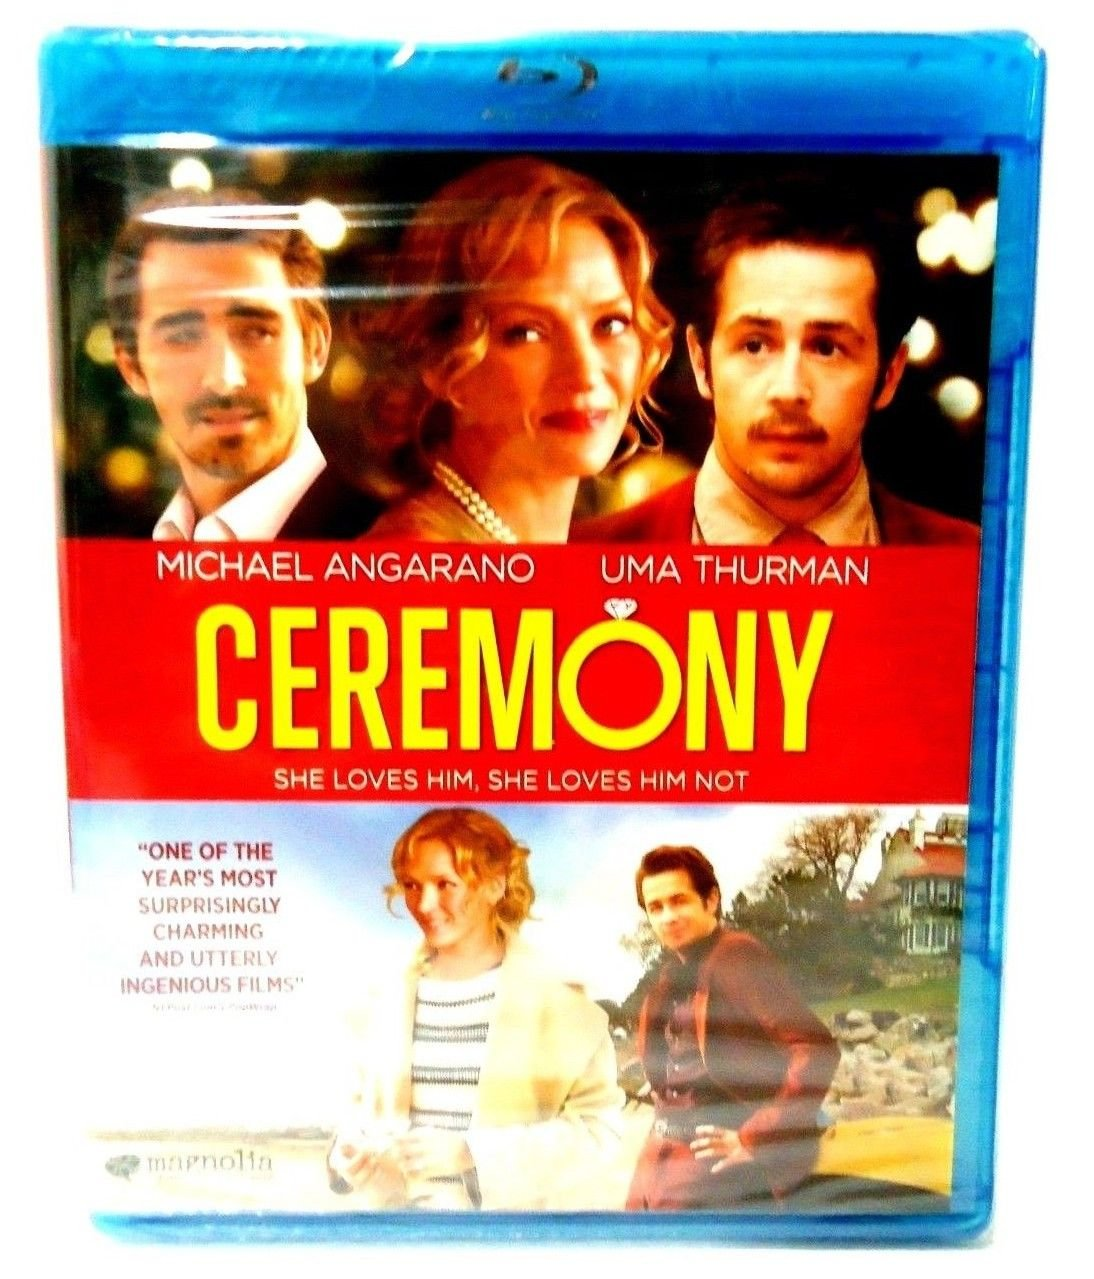 CEREMONY - BLU-RAY - DVD - UMA THURMAN - MICHAEL ANGARANO - NEW - COMEDY - MOVIE